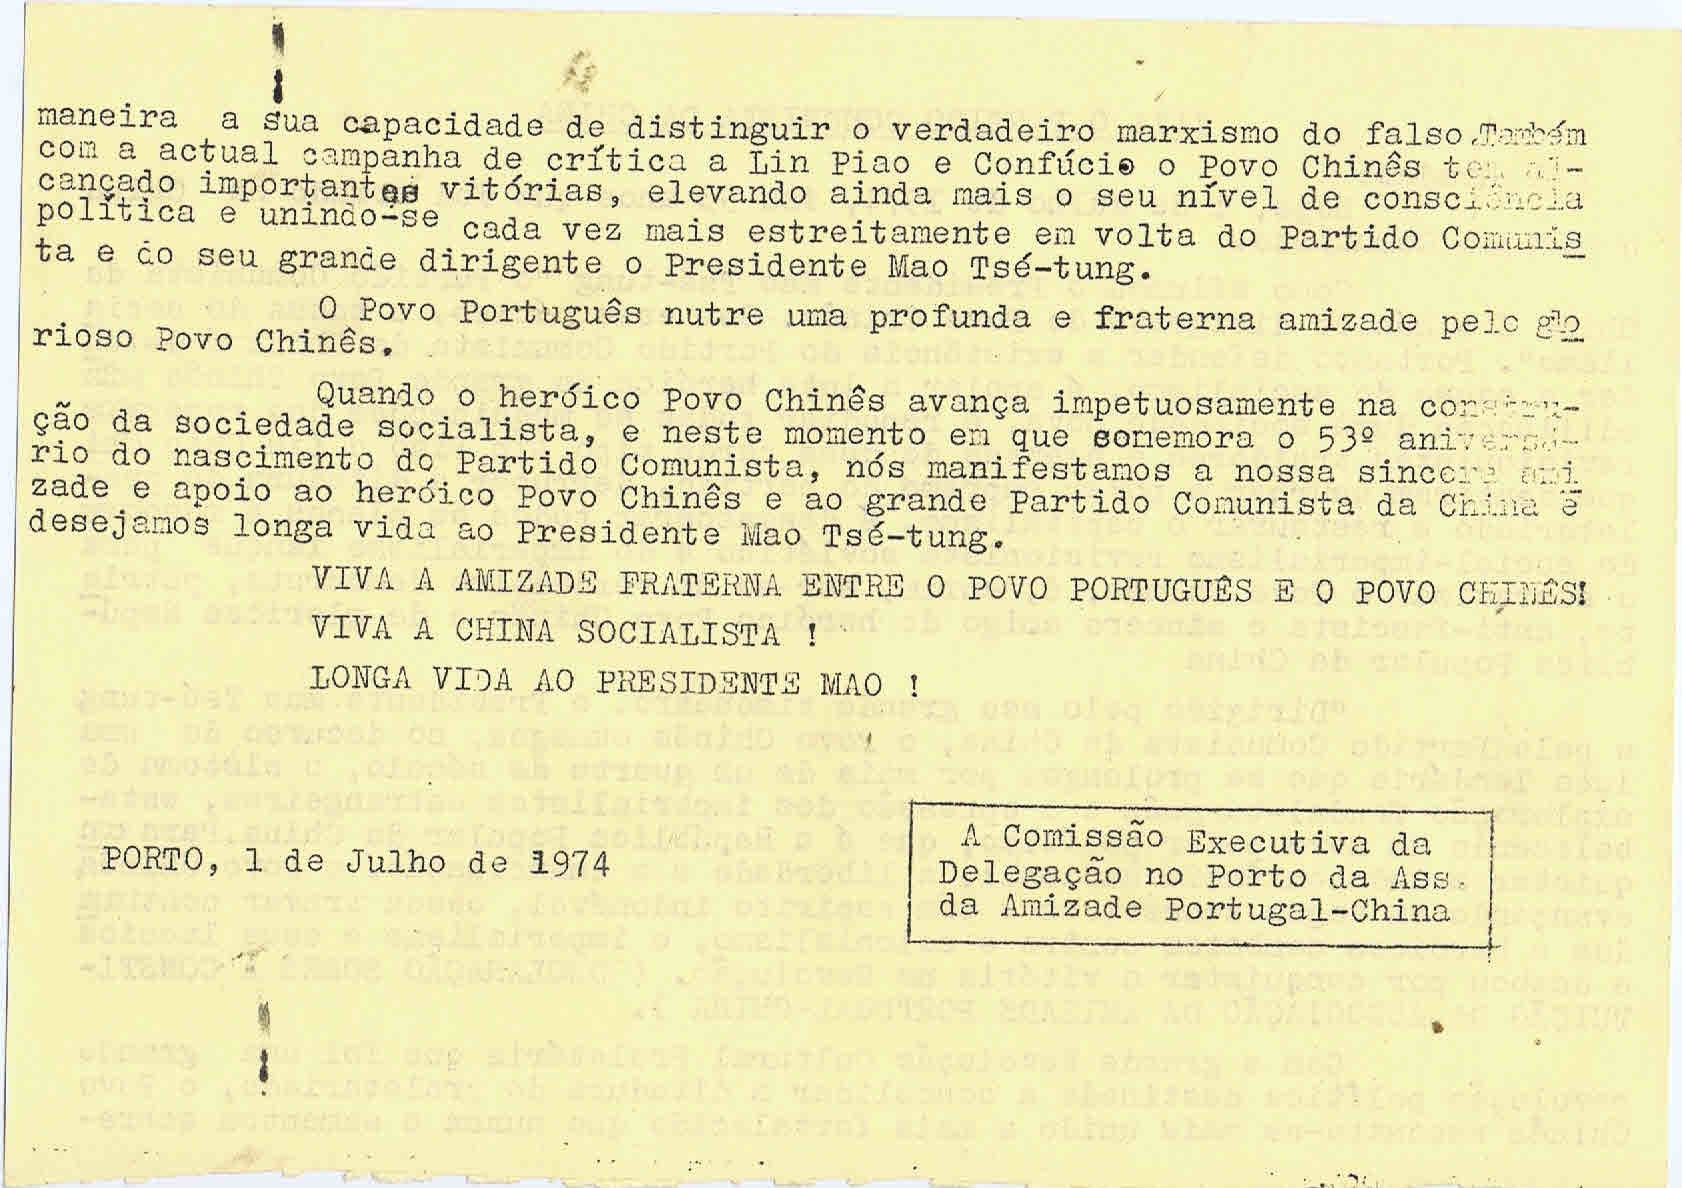 Calendario 2019 Colombia Almanaque Abril 1974 Más Recientemente Liberado associa‡ƒo Da Amizade Portugal – China Aapc – Ephemera